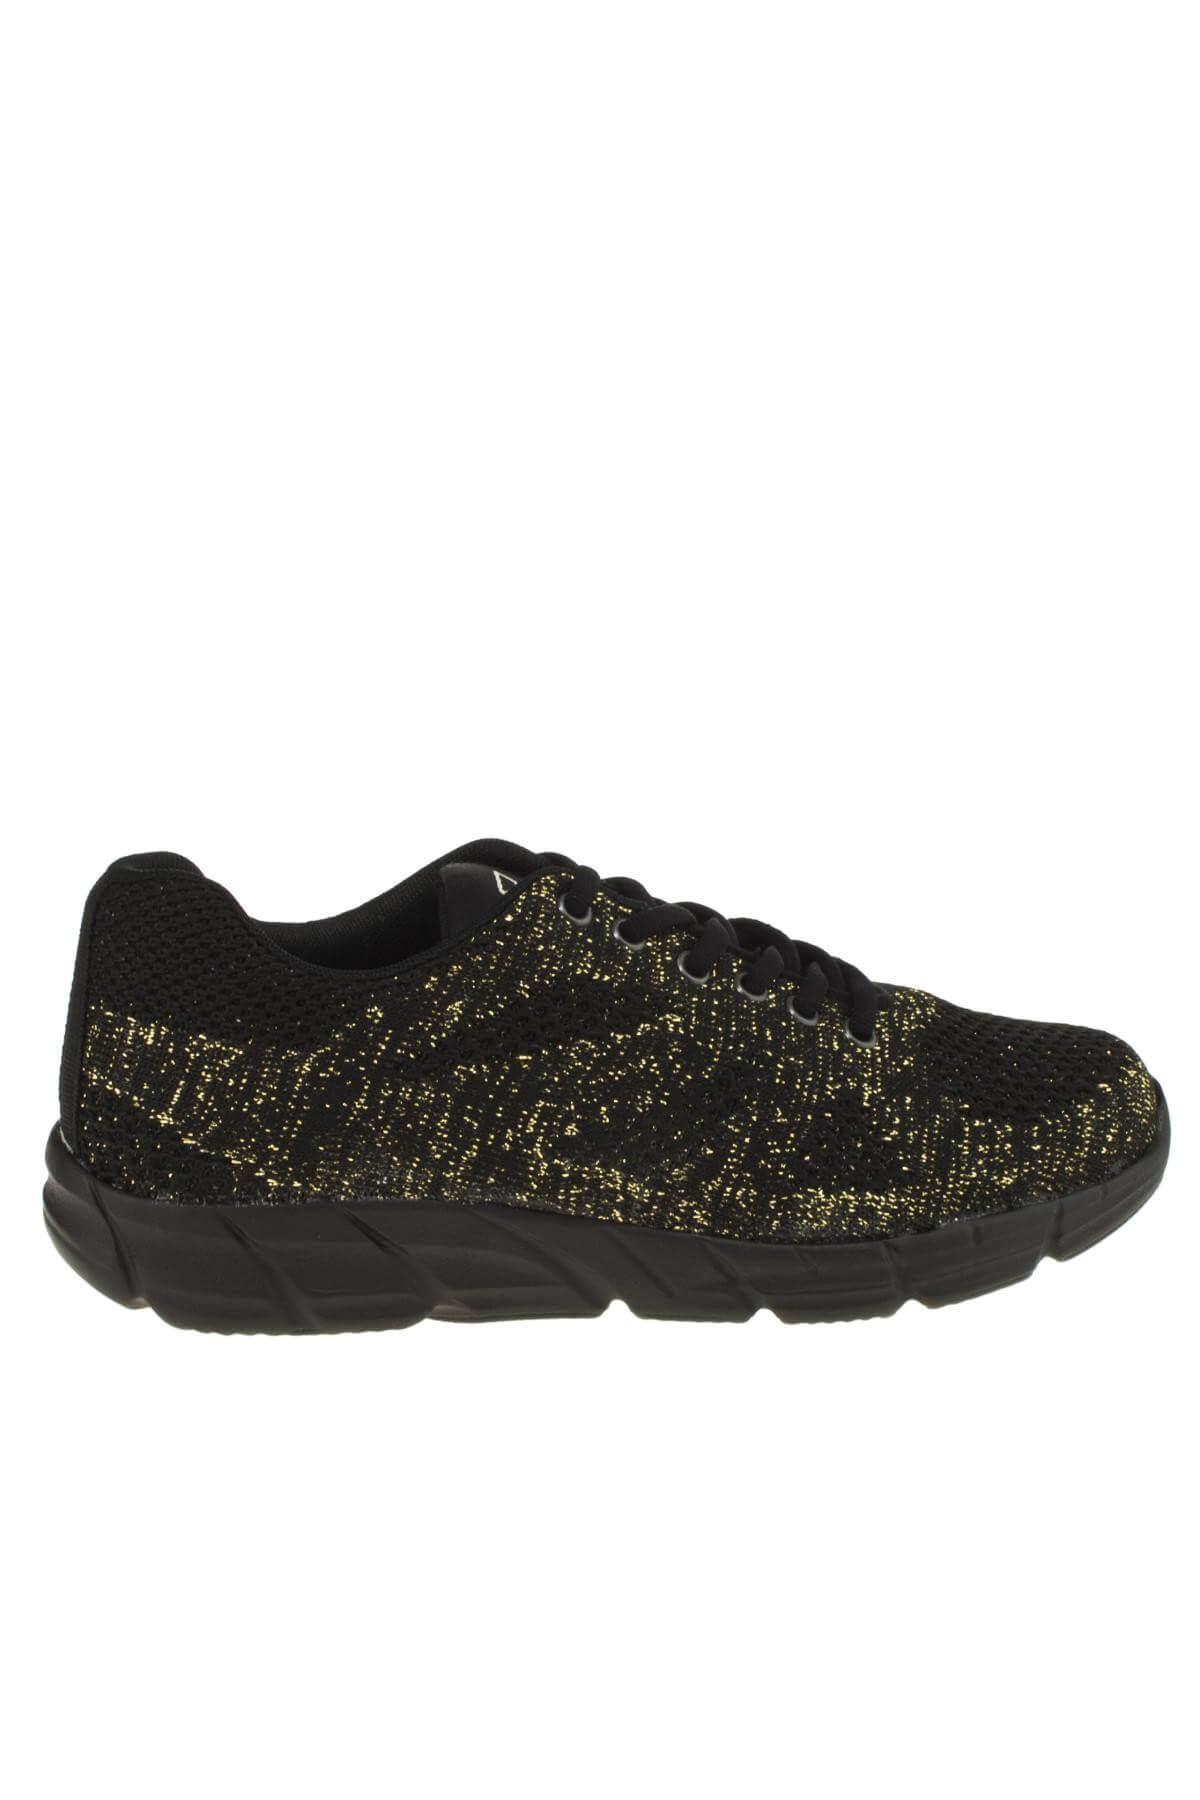 Scooter Unisex Siyah Sarı  Sneaker 186 5437G 2